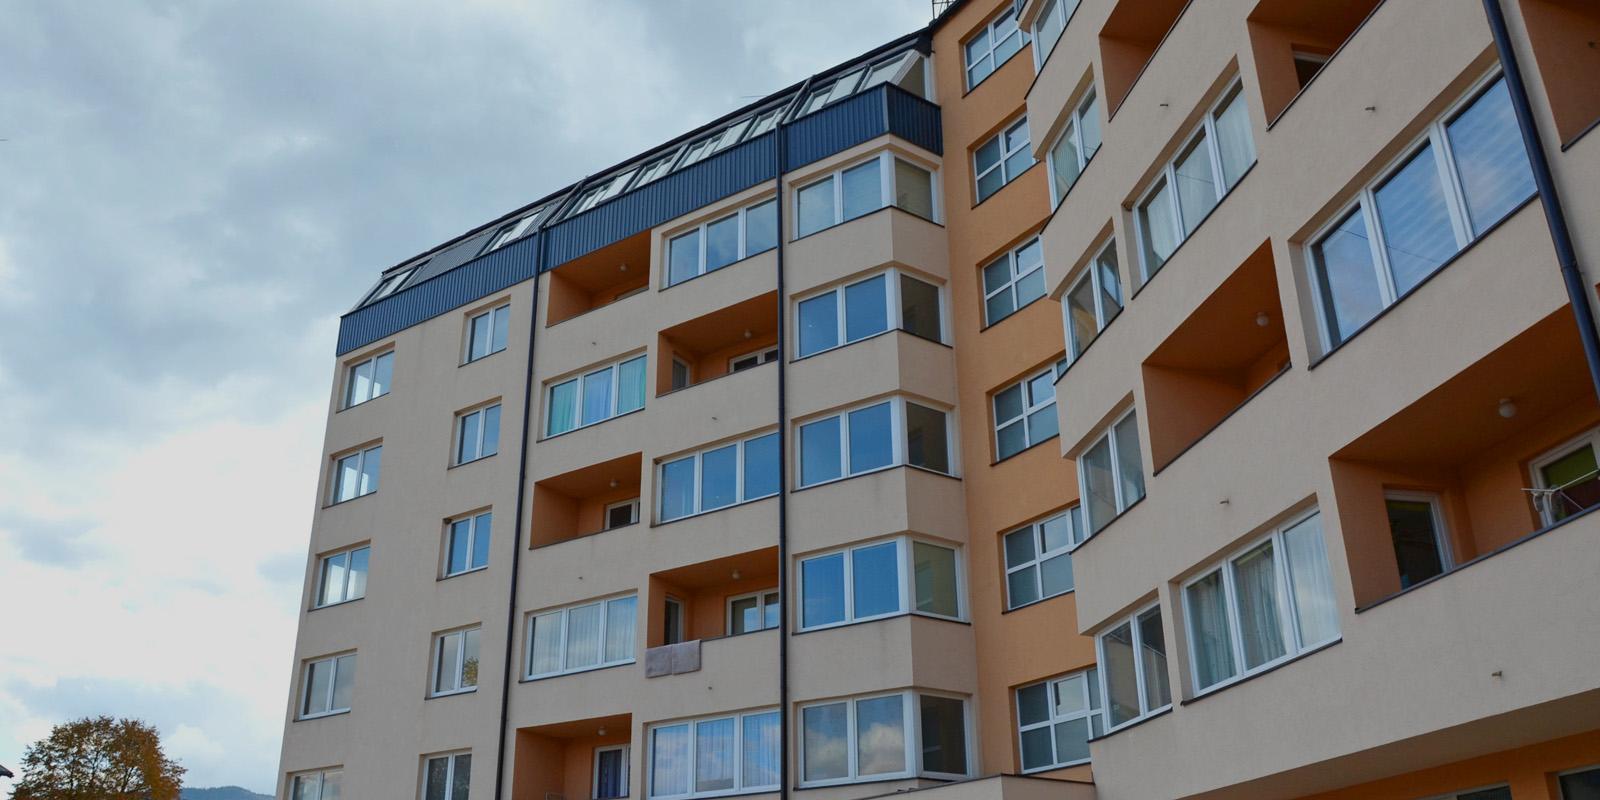 Majnex Zgrada Pale